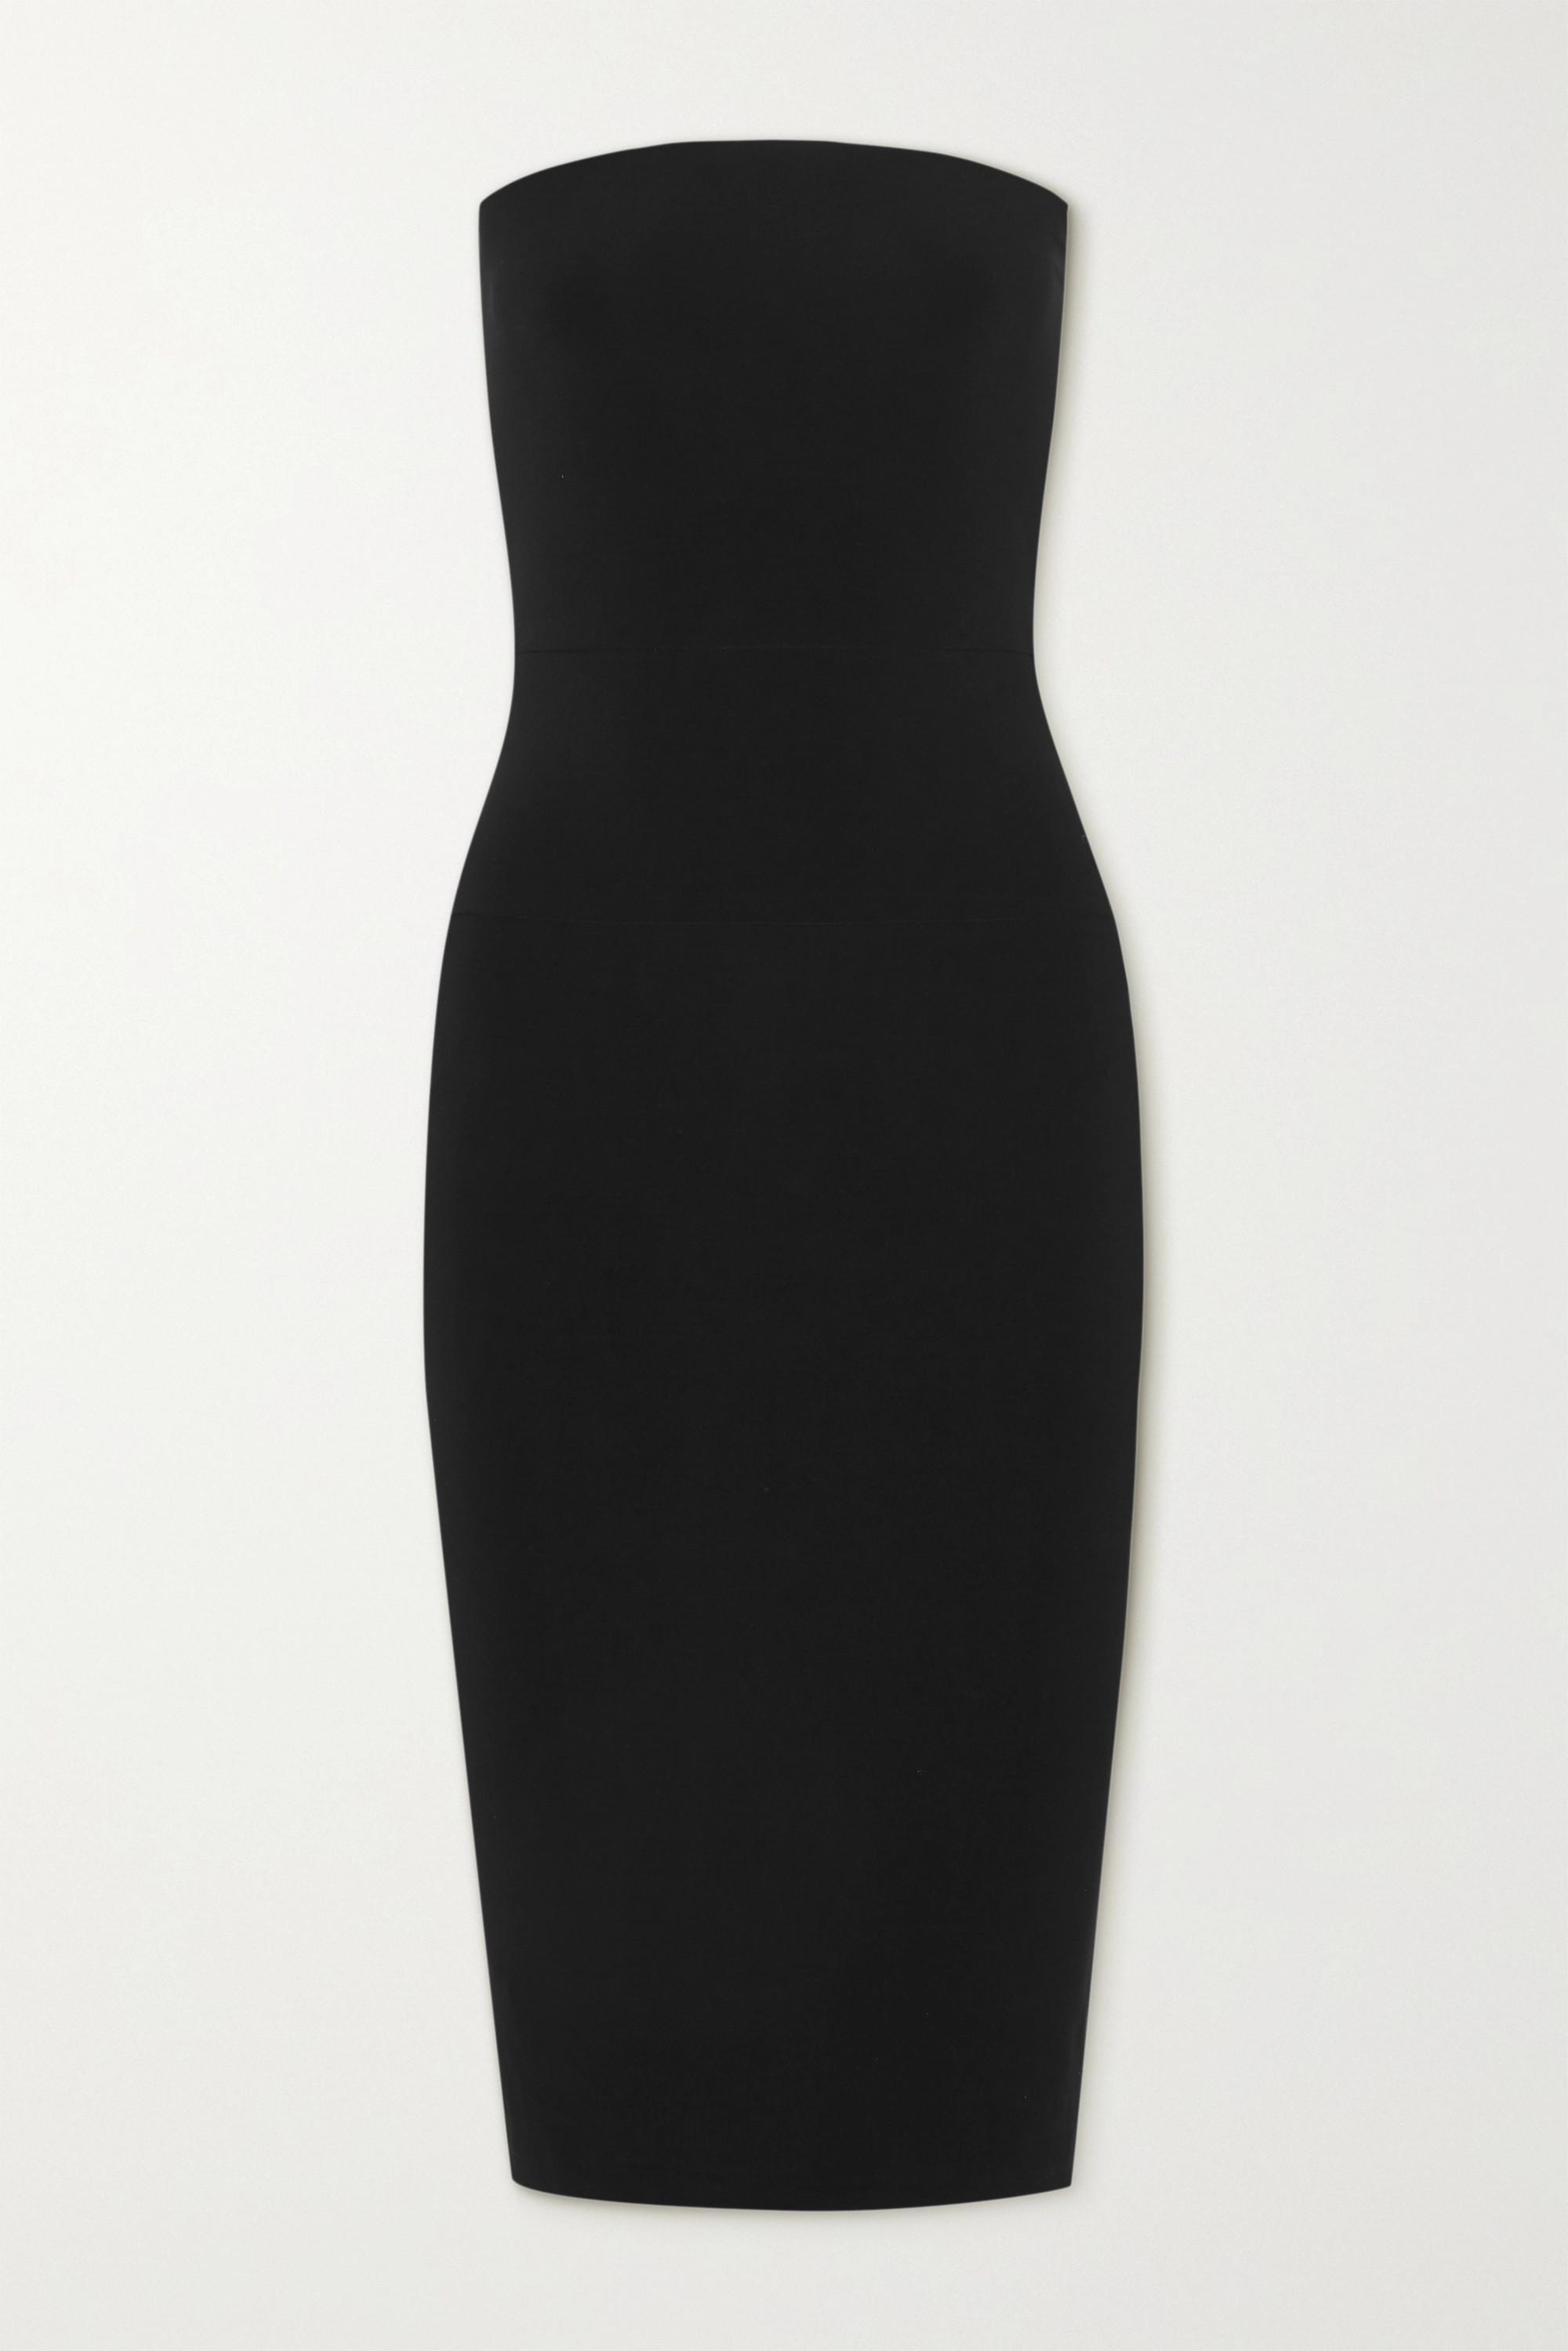 Norma Kamali Strapless stretch-jersey dress